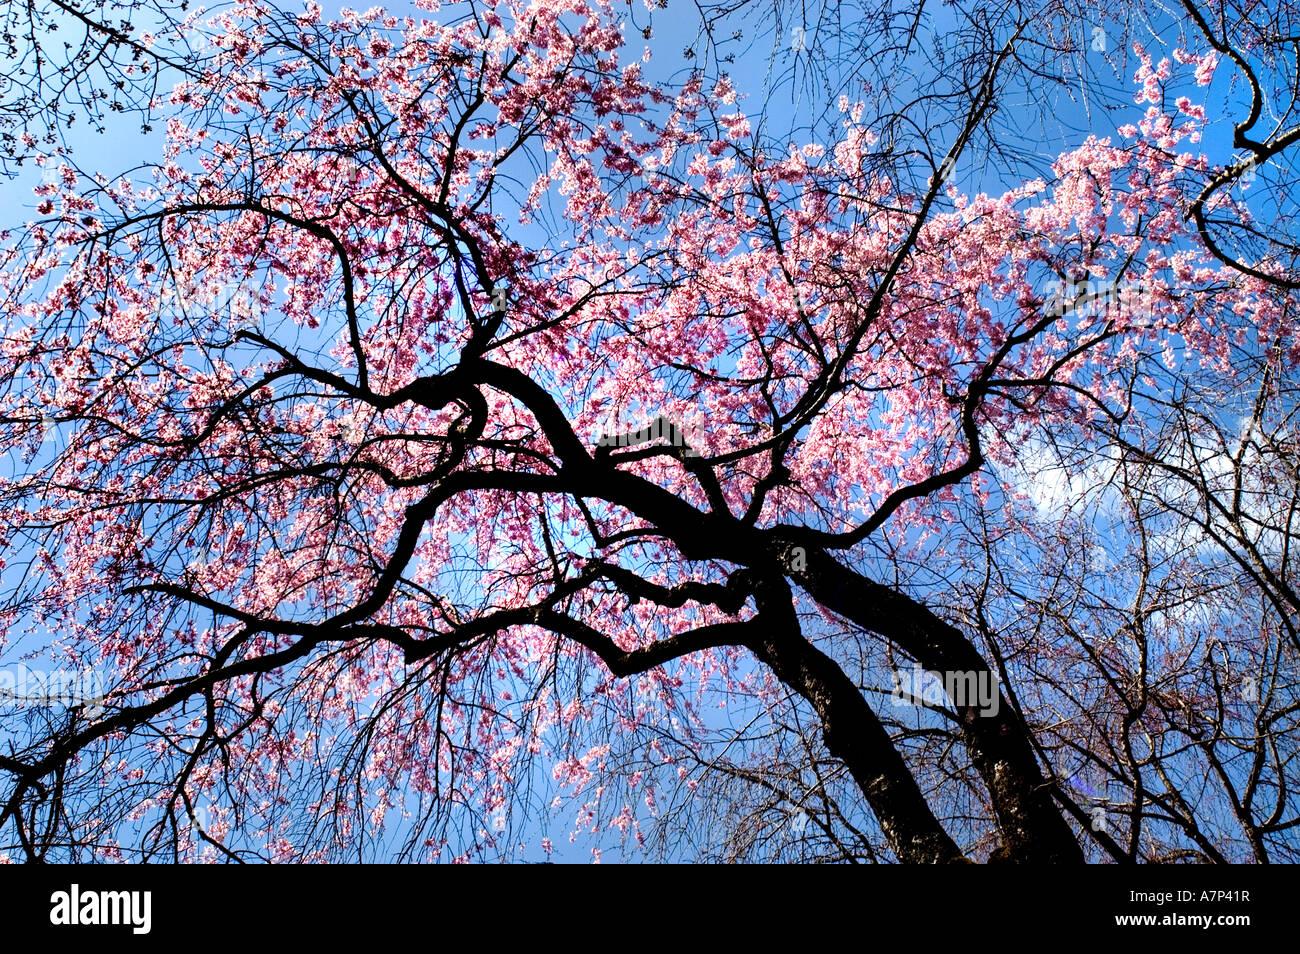 diagram the parts of cherry blossom tree 2001 toyota camry wiring in nijo castle tokugawa ieyasu shogun